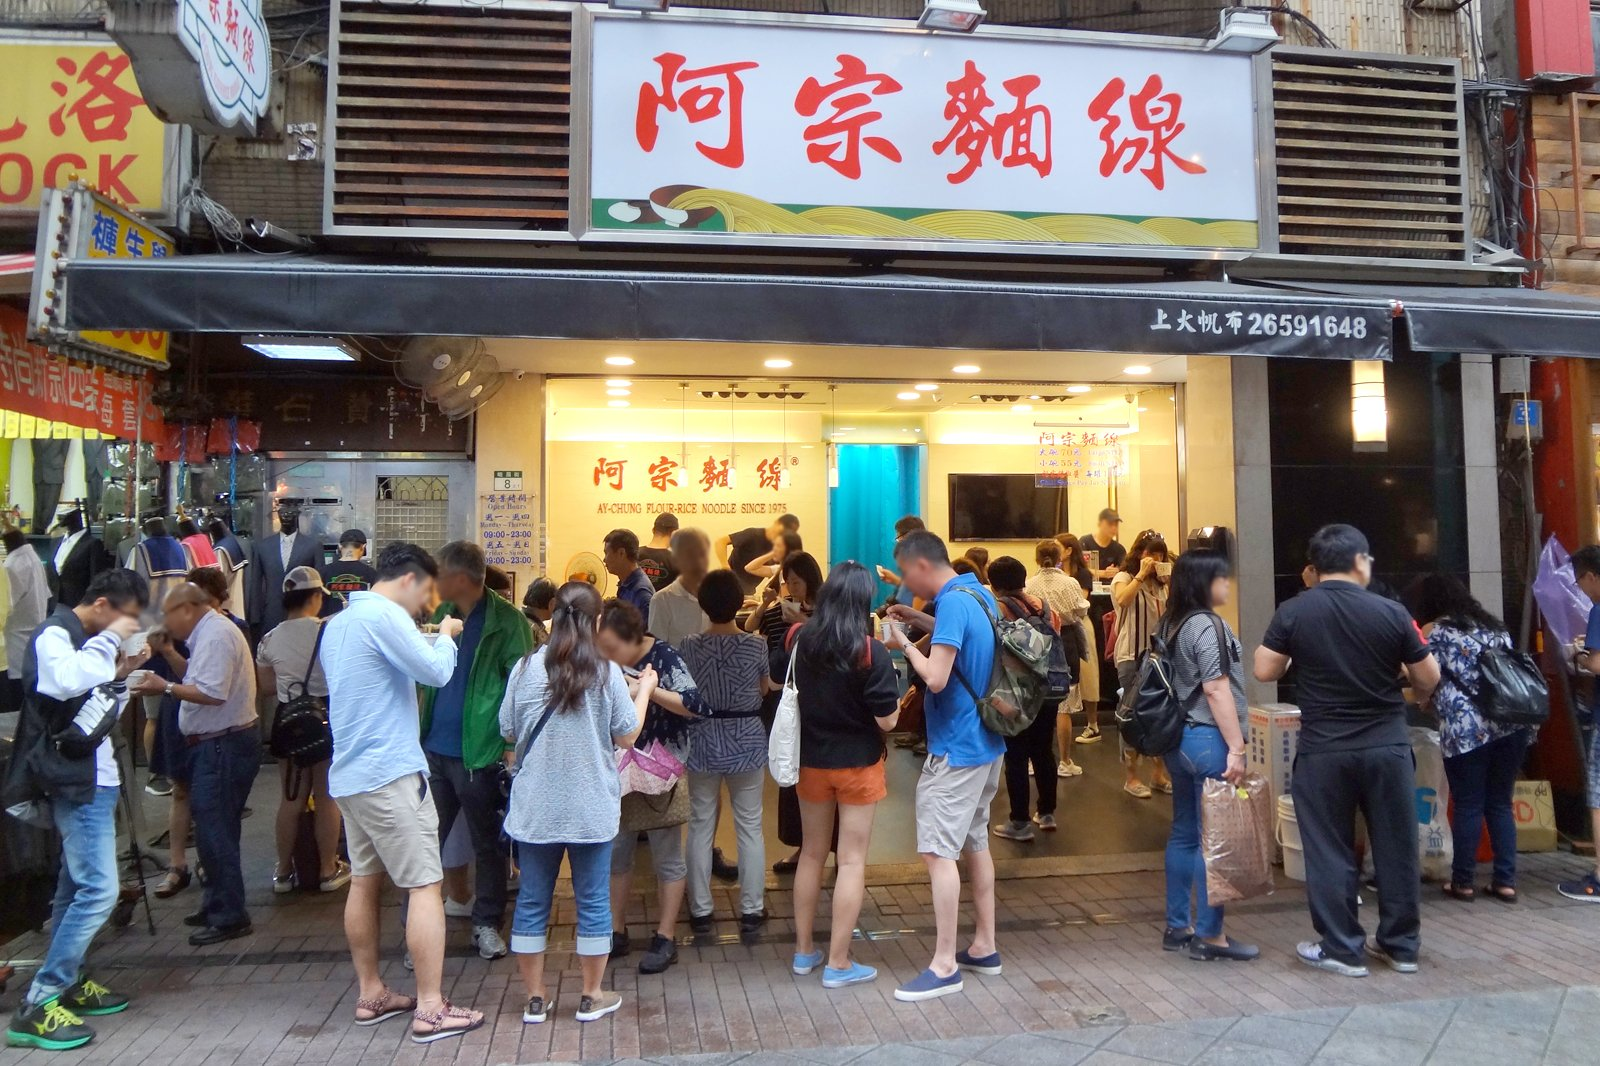 9 Best Local Restaurants in Taipei - Most Popular Local